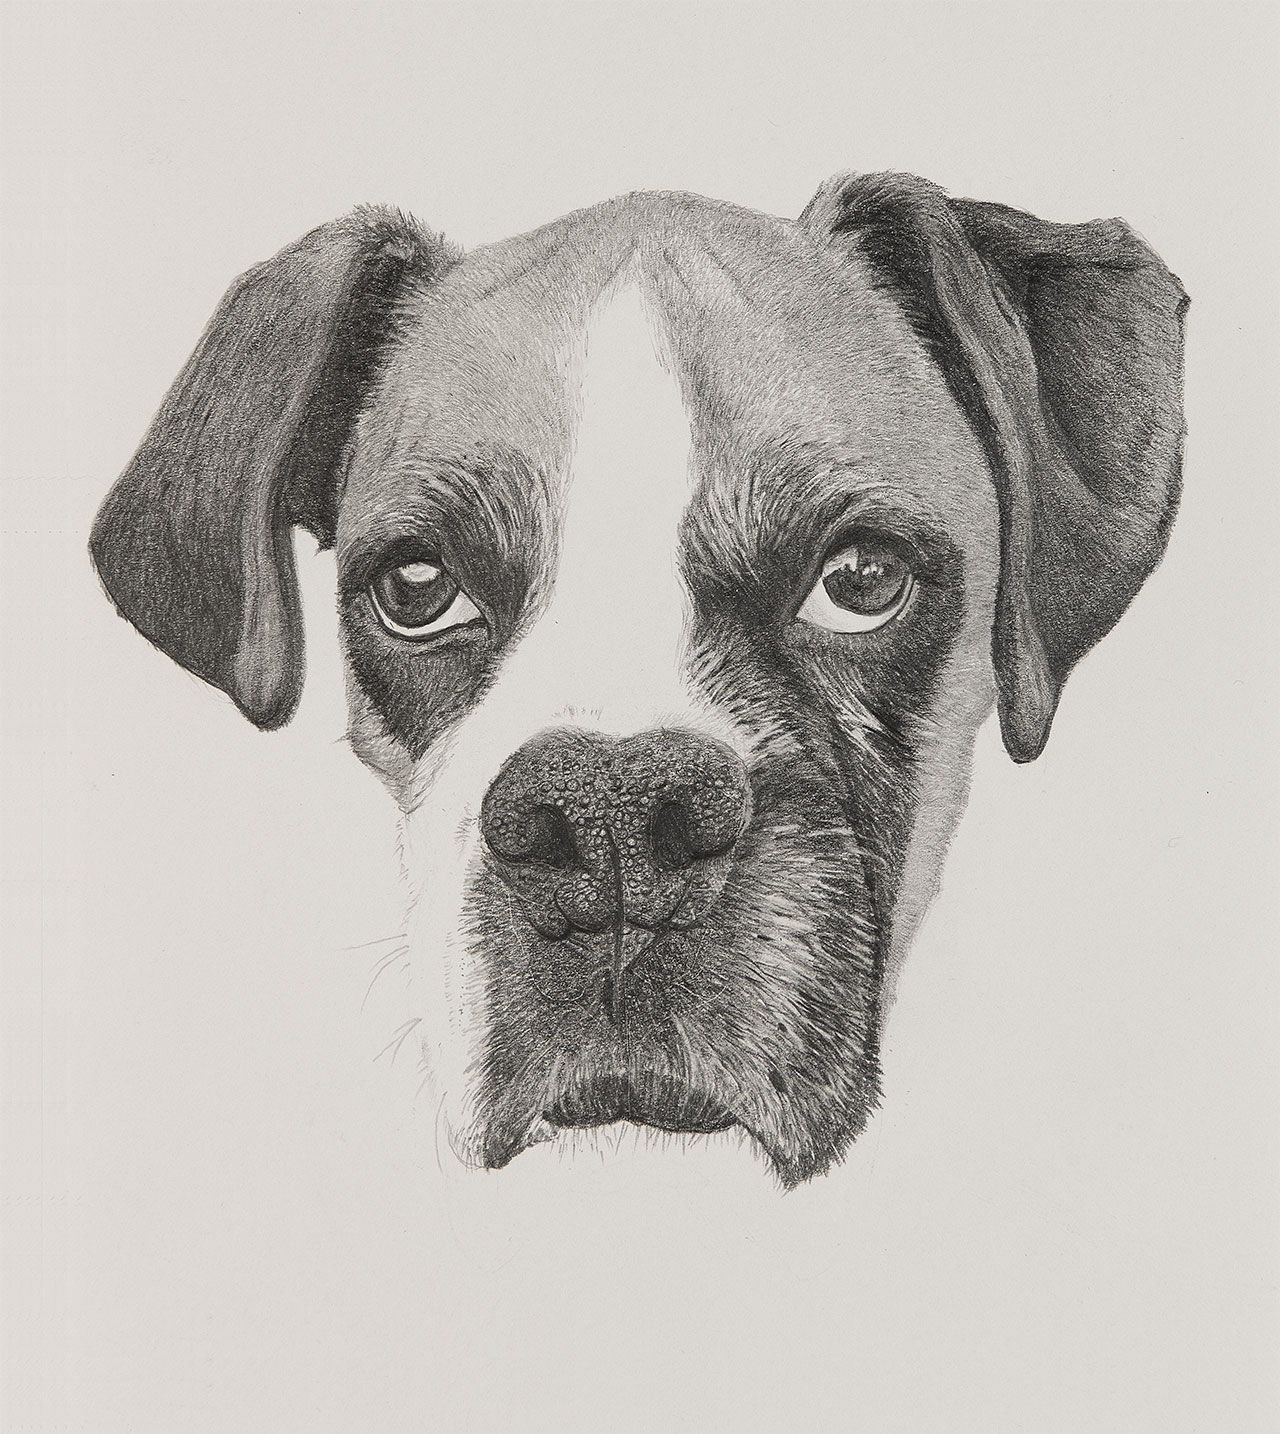 CC Dog Illustration by Harv Craven